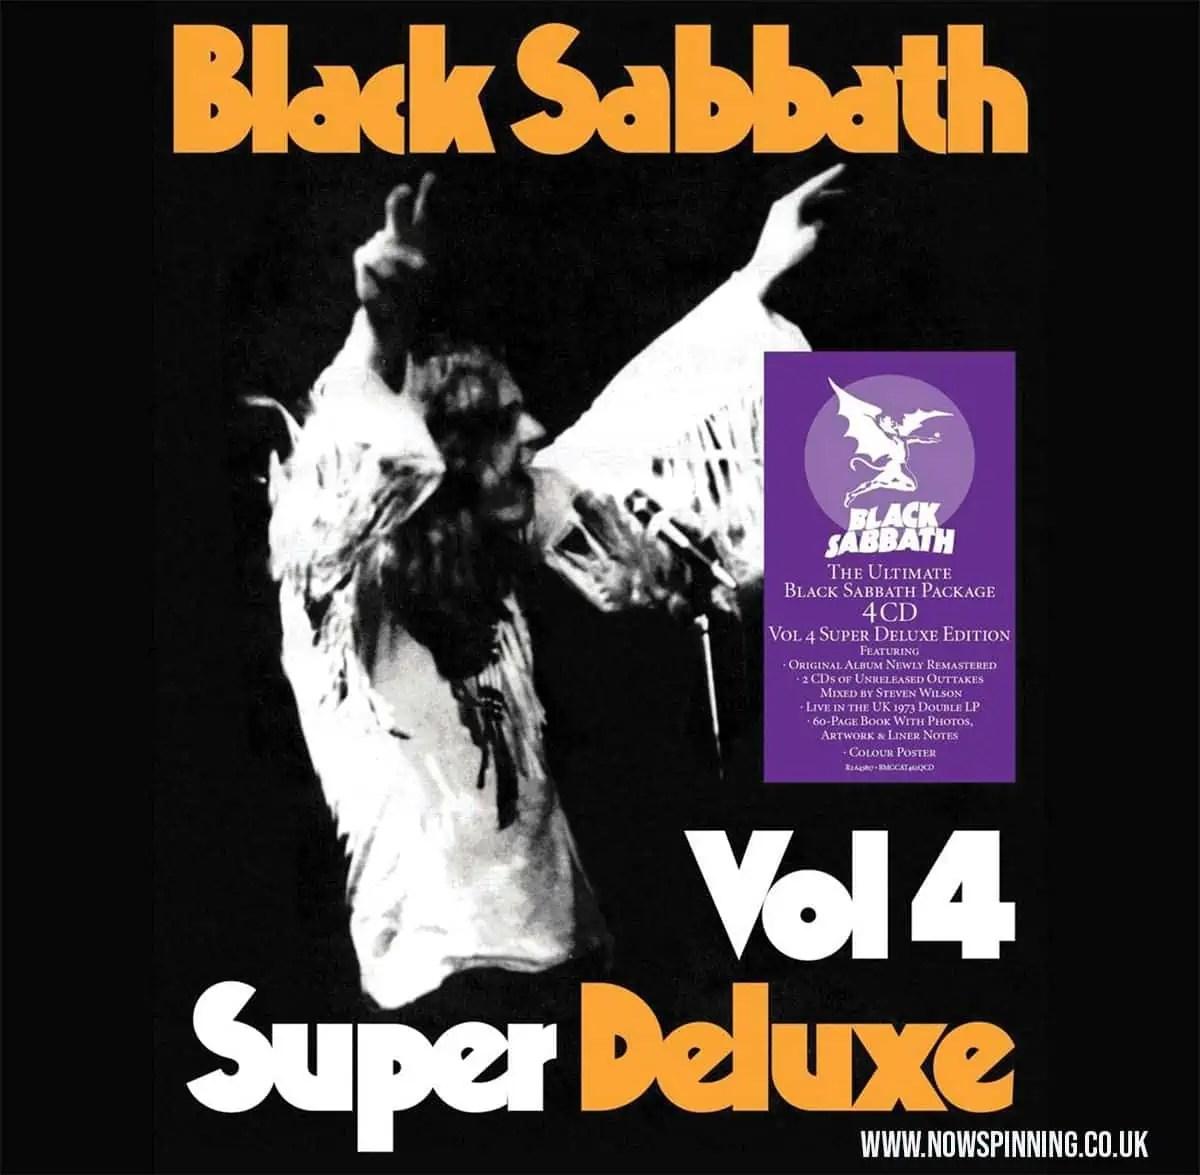 Vol 4 Black Sabbath Super Deluxe Edition